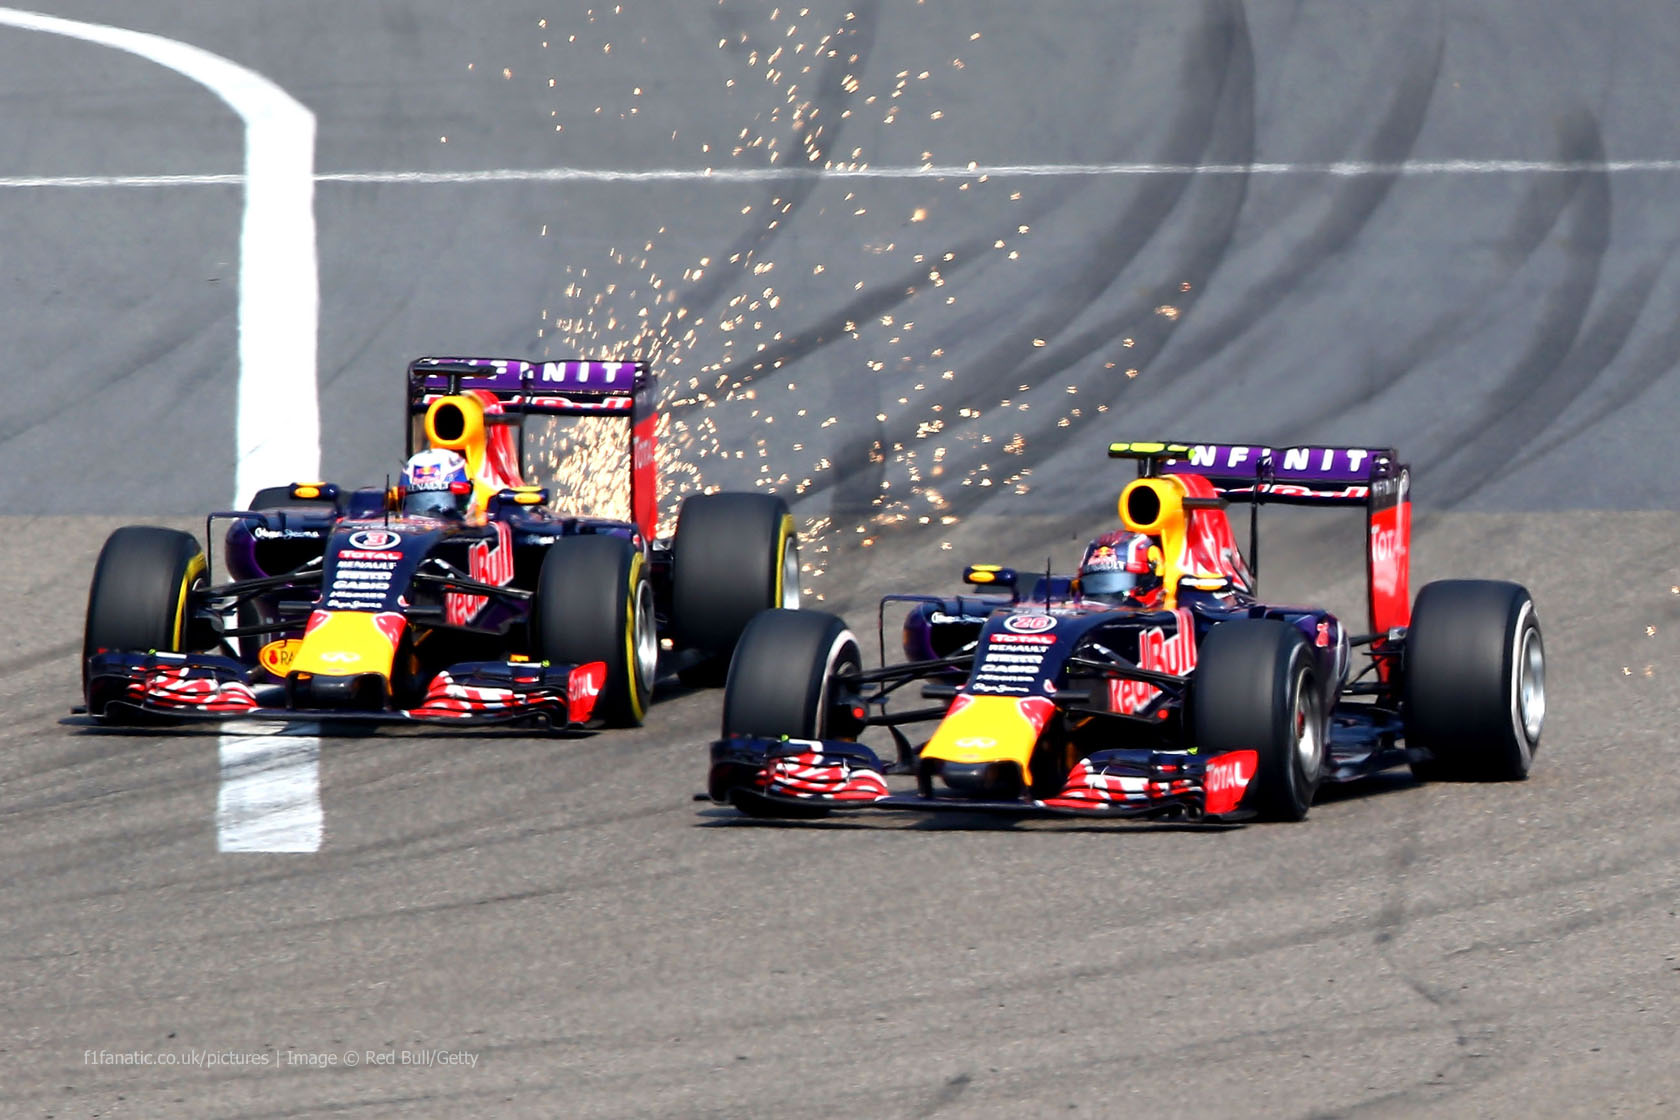 Daniil Kvyat, Daniel Ricciardo, Red Bull, Shanghai International Circuit, 2015